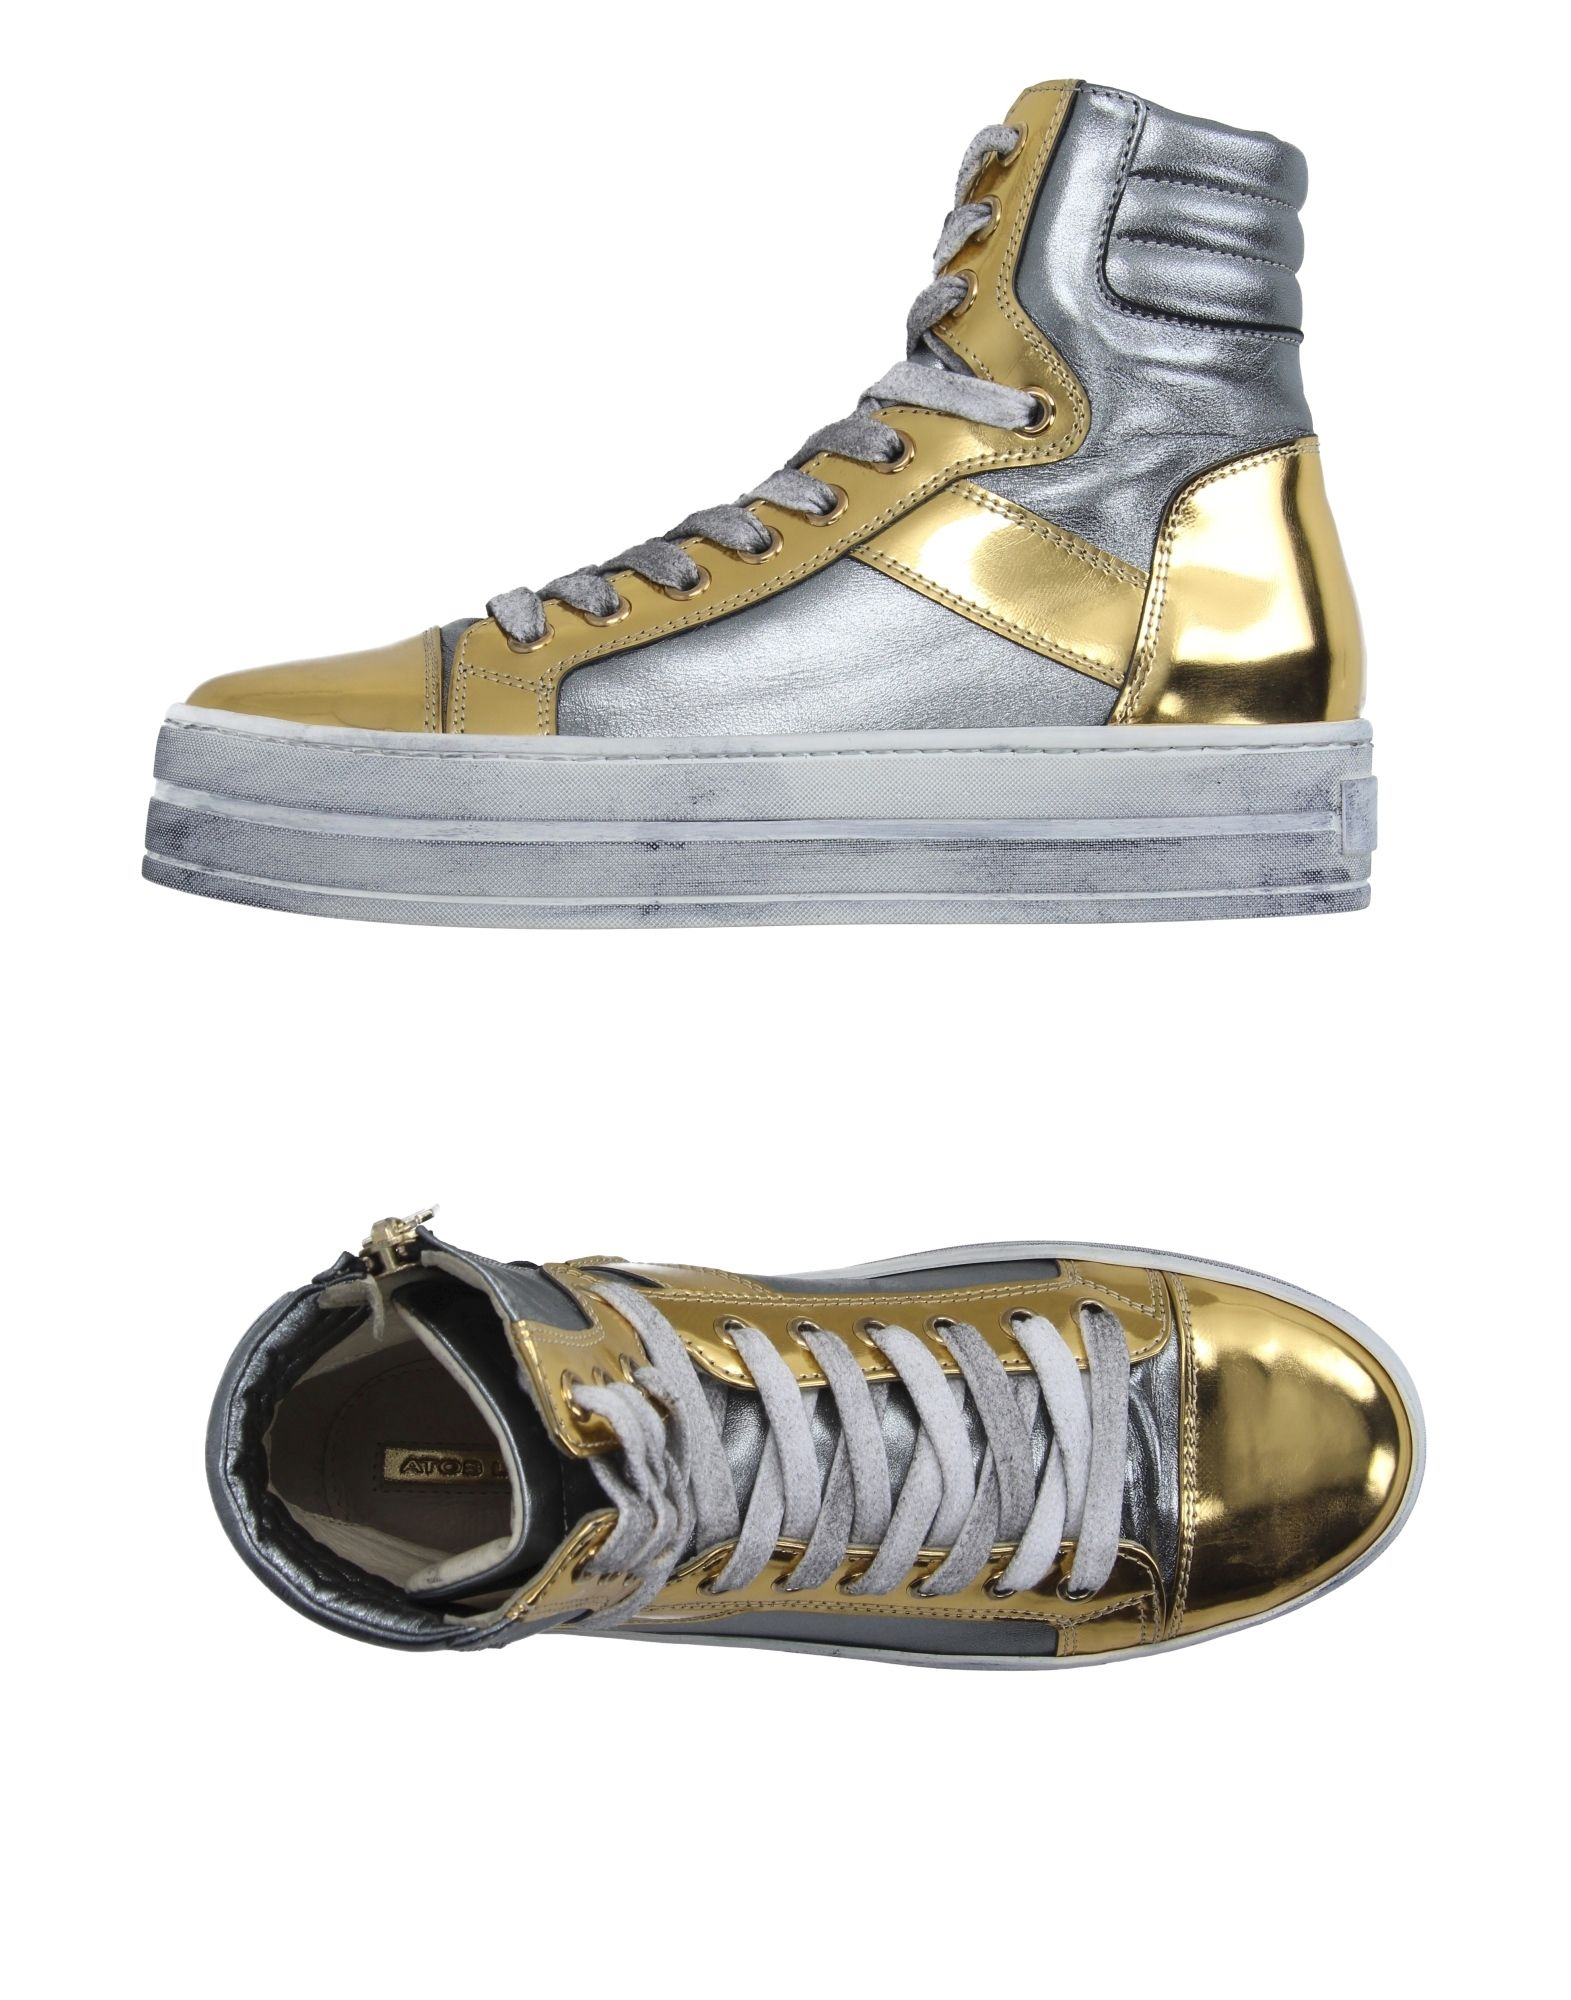 ATOS LOMBARDINI Высокие кеды и кроссовки atos lombardini полусапоги и высокие ботинки